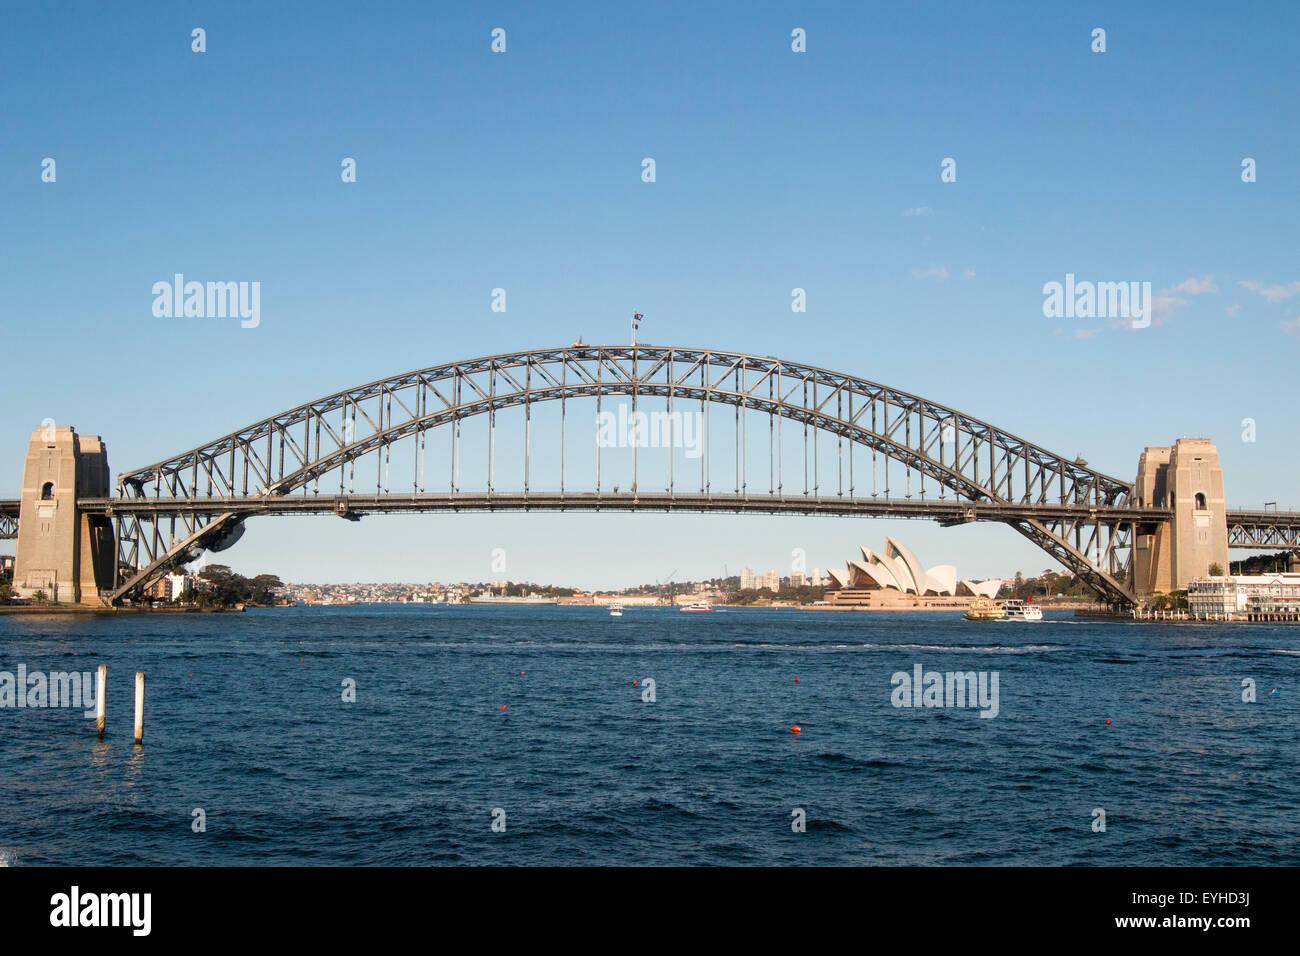 Sydney opera house and harbour bridge - Stock Photo Sydney Harbour Bridge And Sydney Opera House Viewed From Mcmahons Point Wharf Sydney Australia